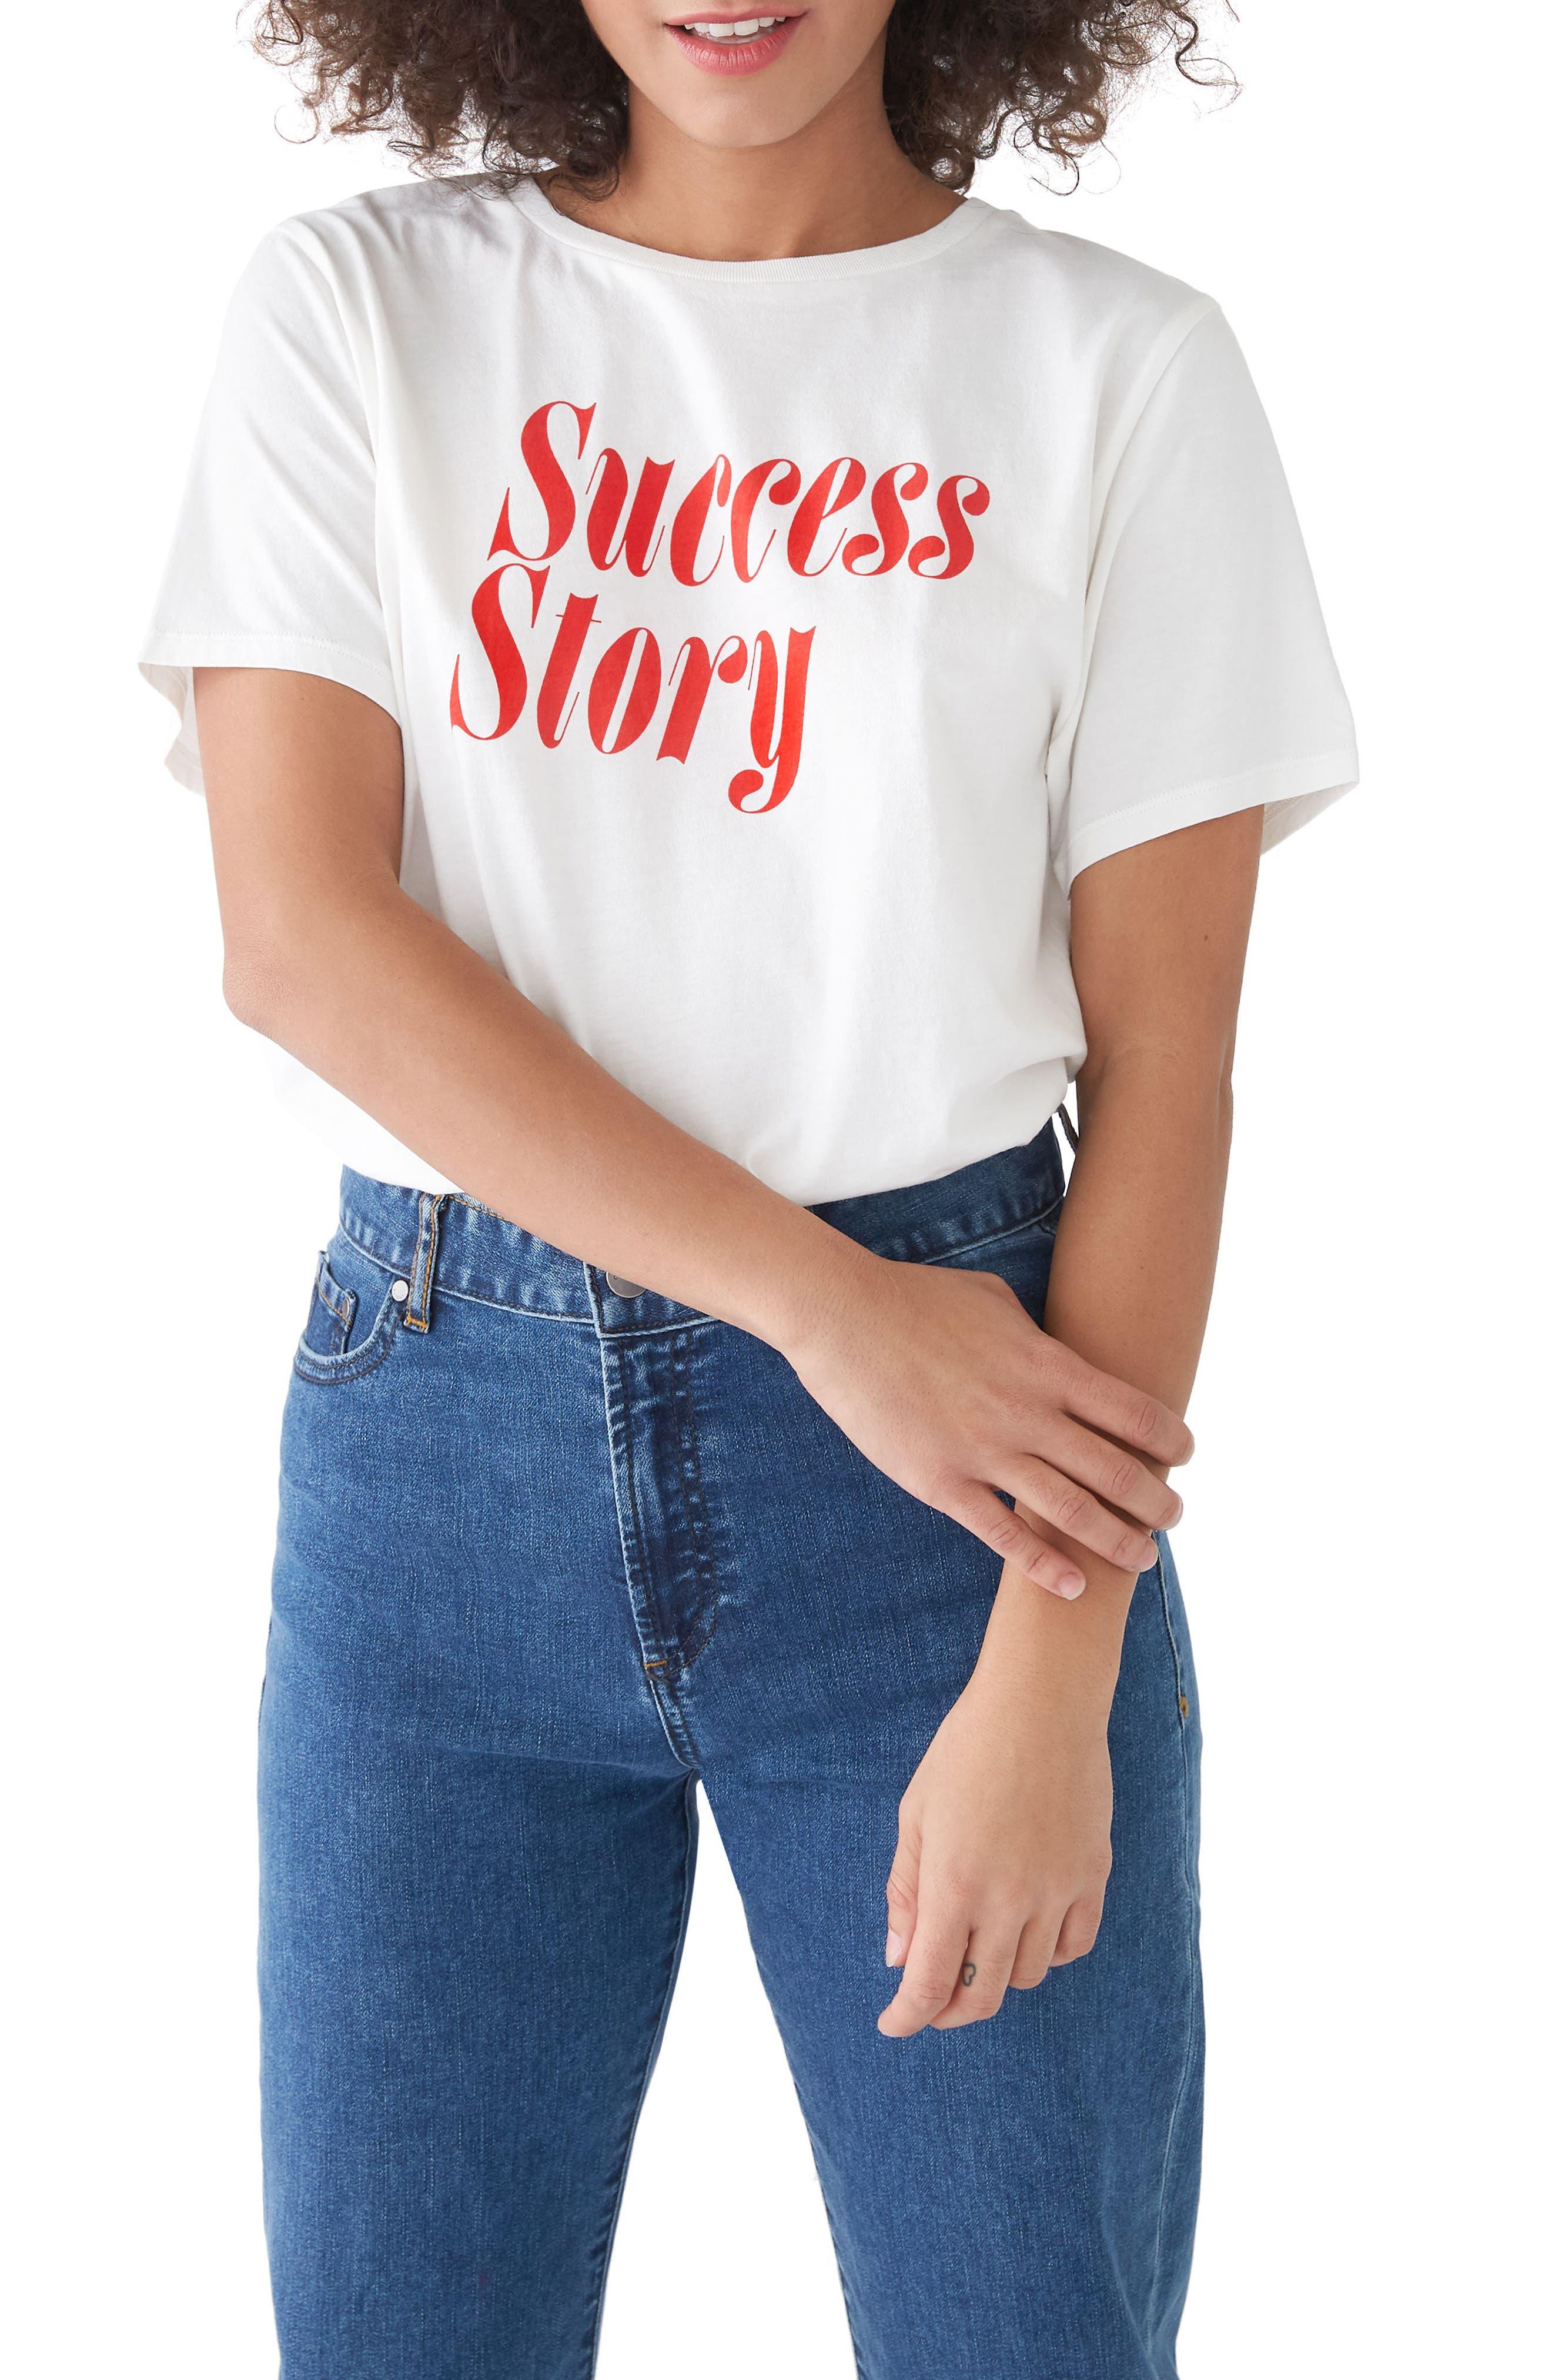 BAN.DO BAN. DO SUCCESS STORY CLASSIC TEE